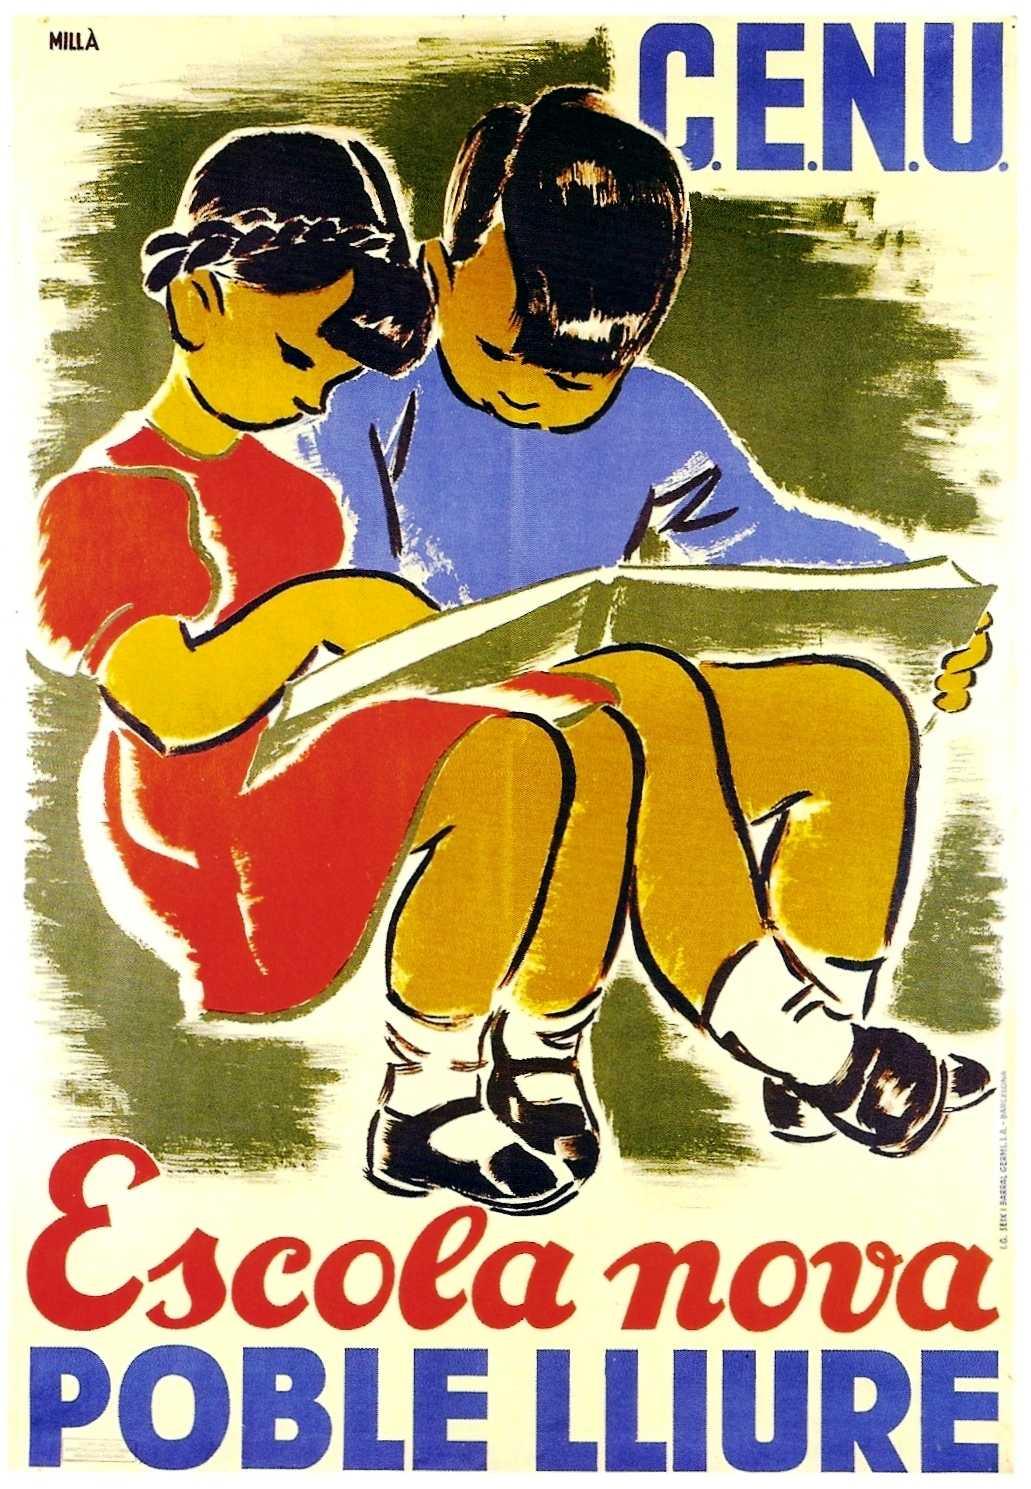 Cartell del CENU, obra de Carme Millà Tersol